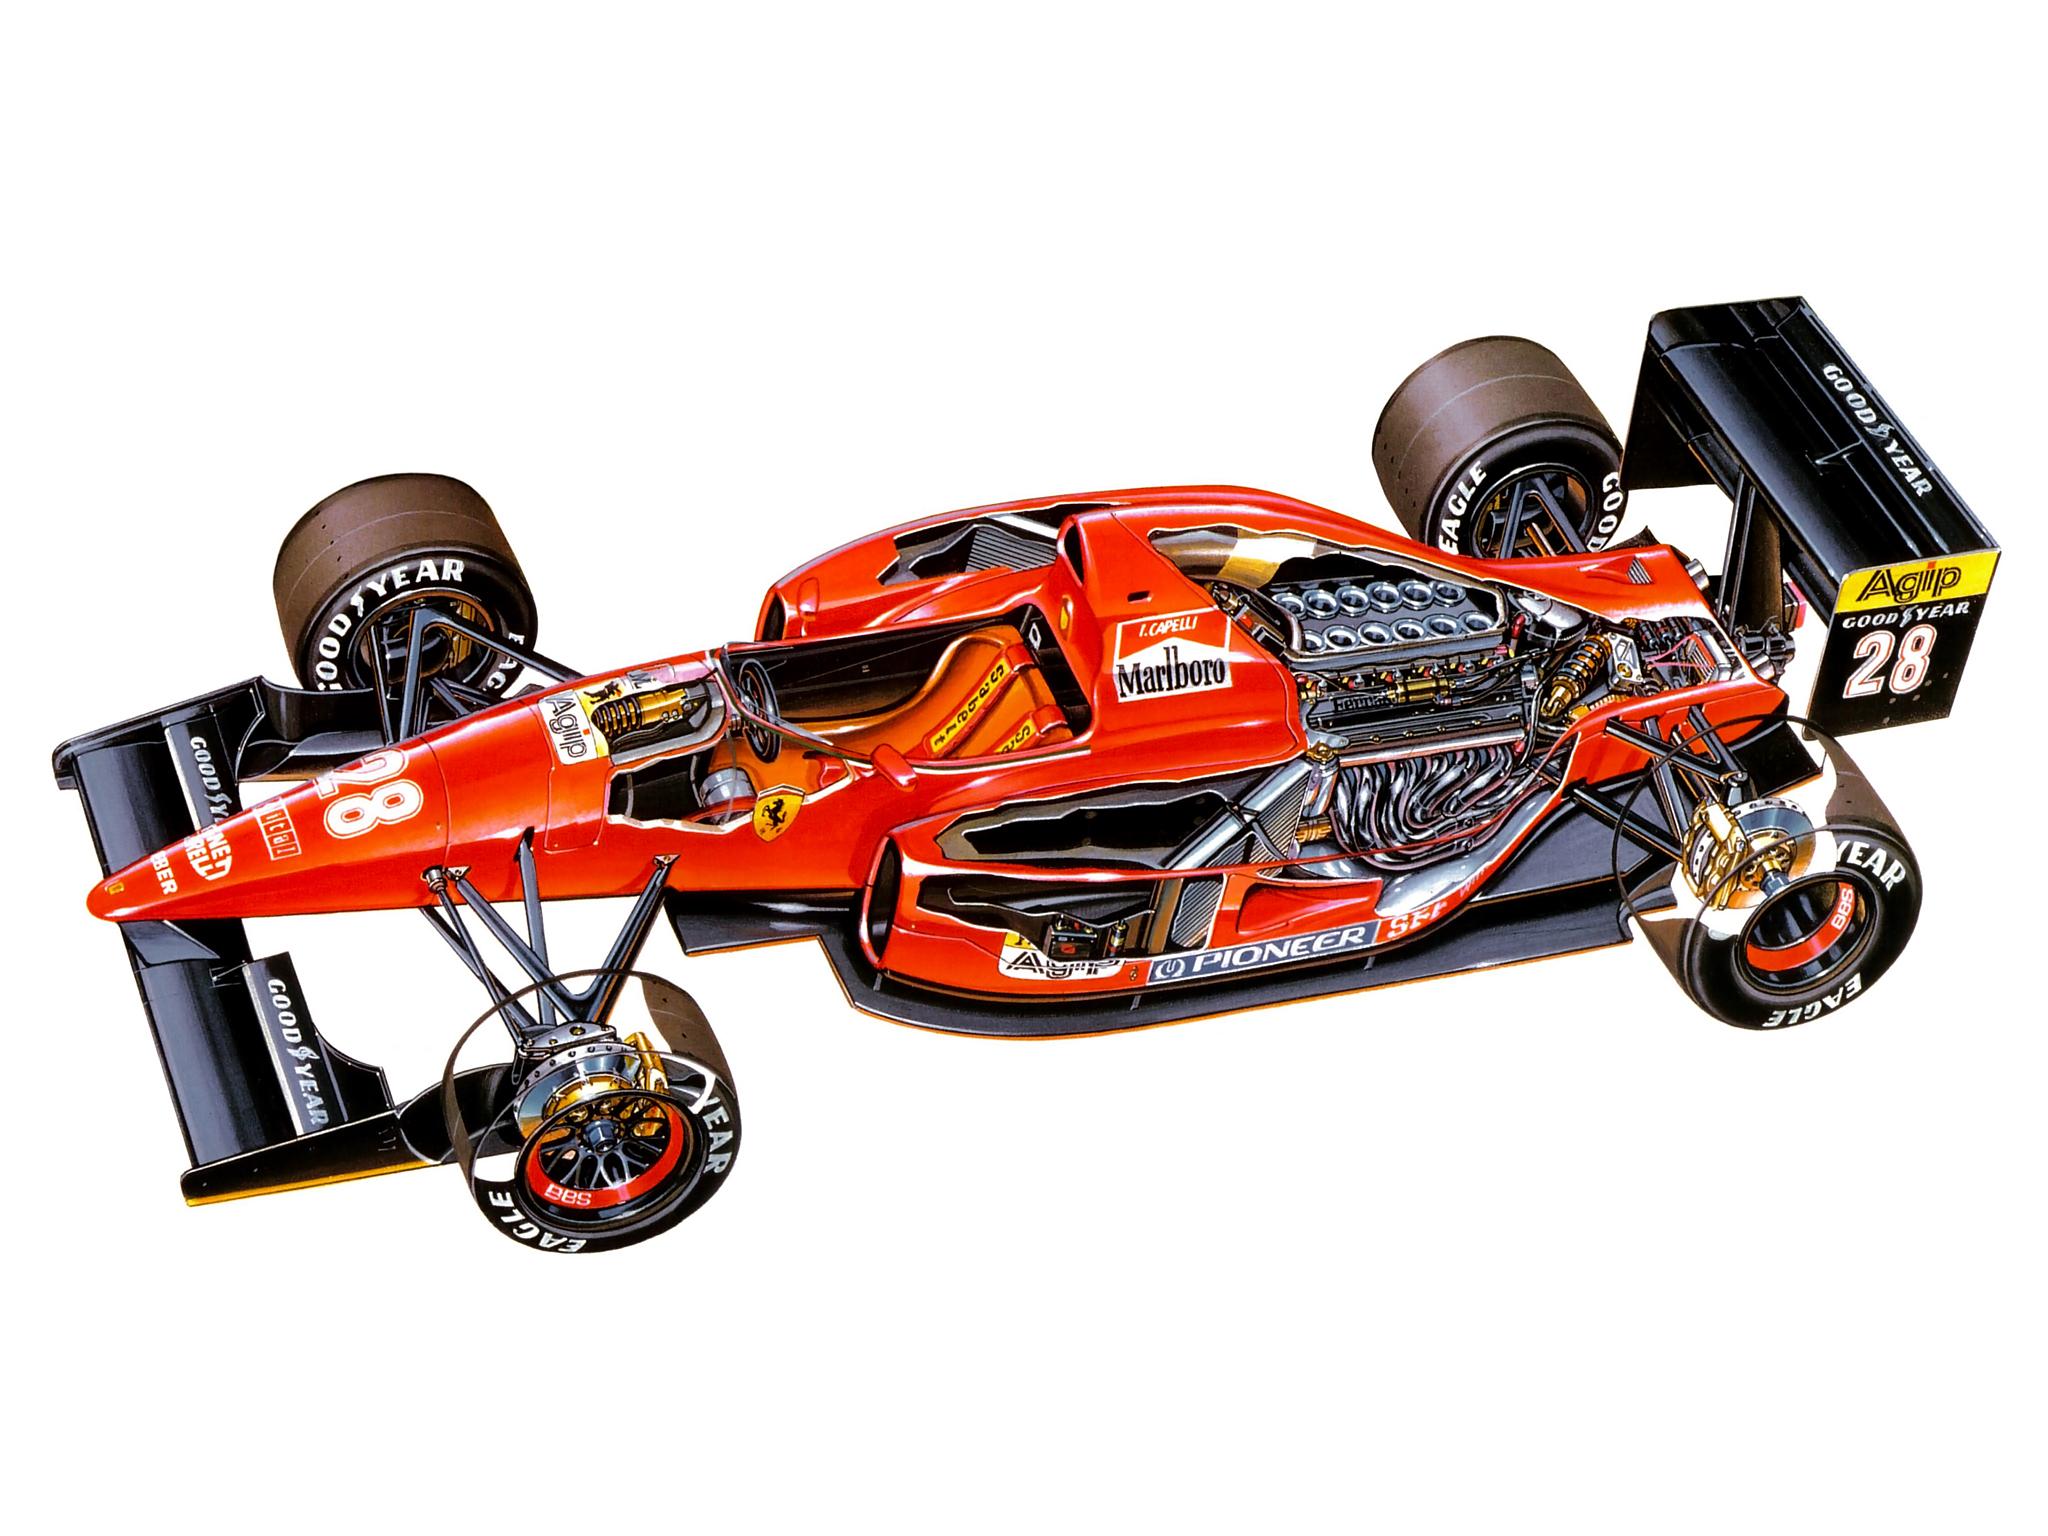 1992 ferrari f92a formula one f 1 race racing engine interior g wallpaper 2048x1536 141293. Black Bedroom Furniture Sets. Home Design Ideas